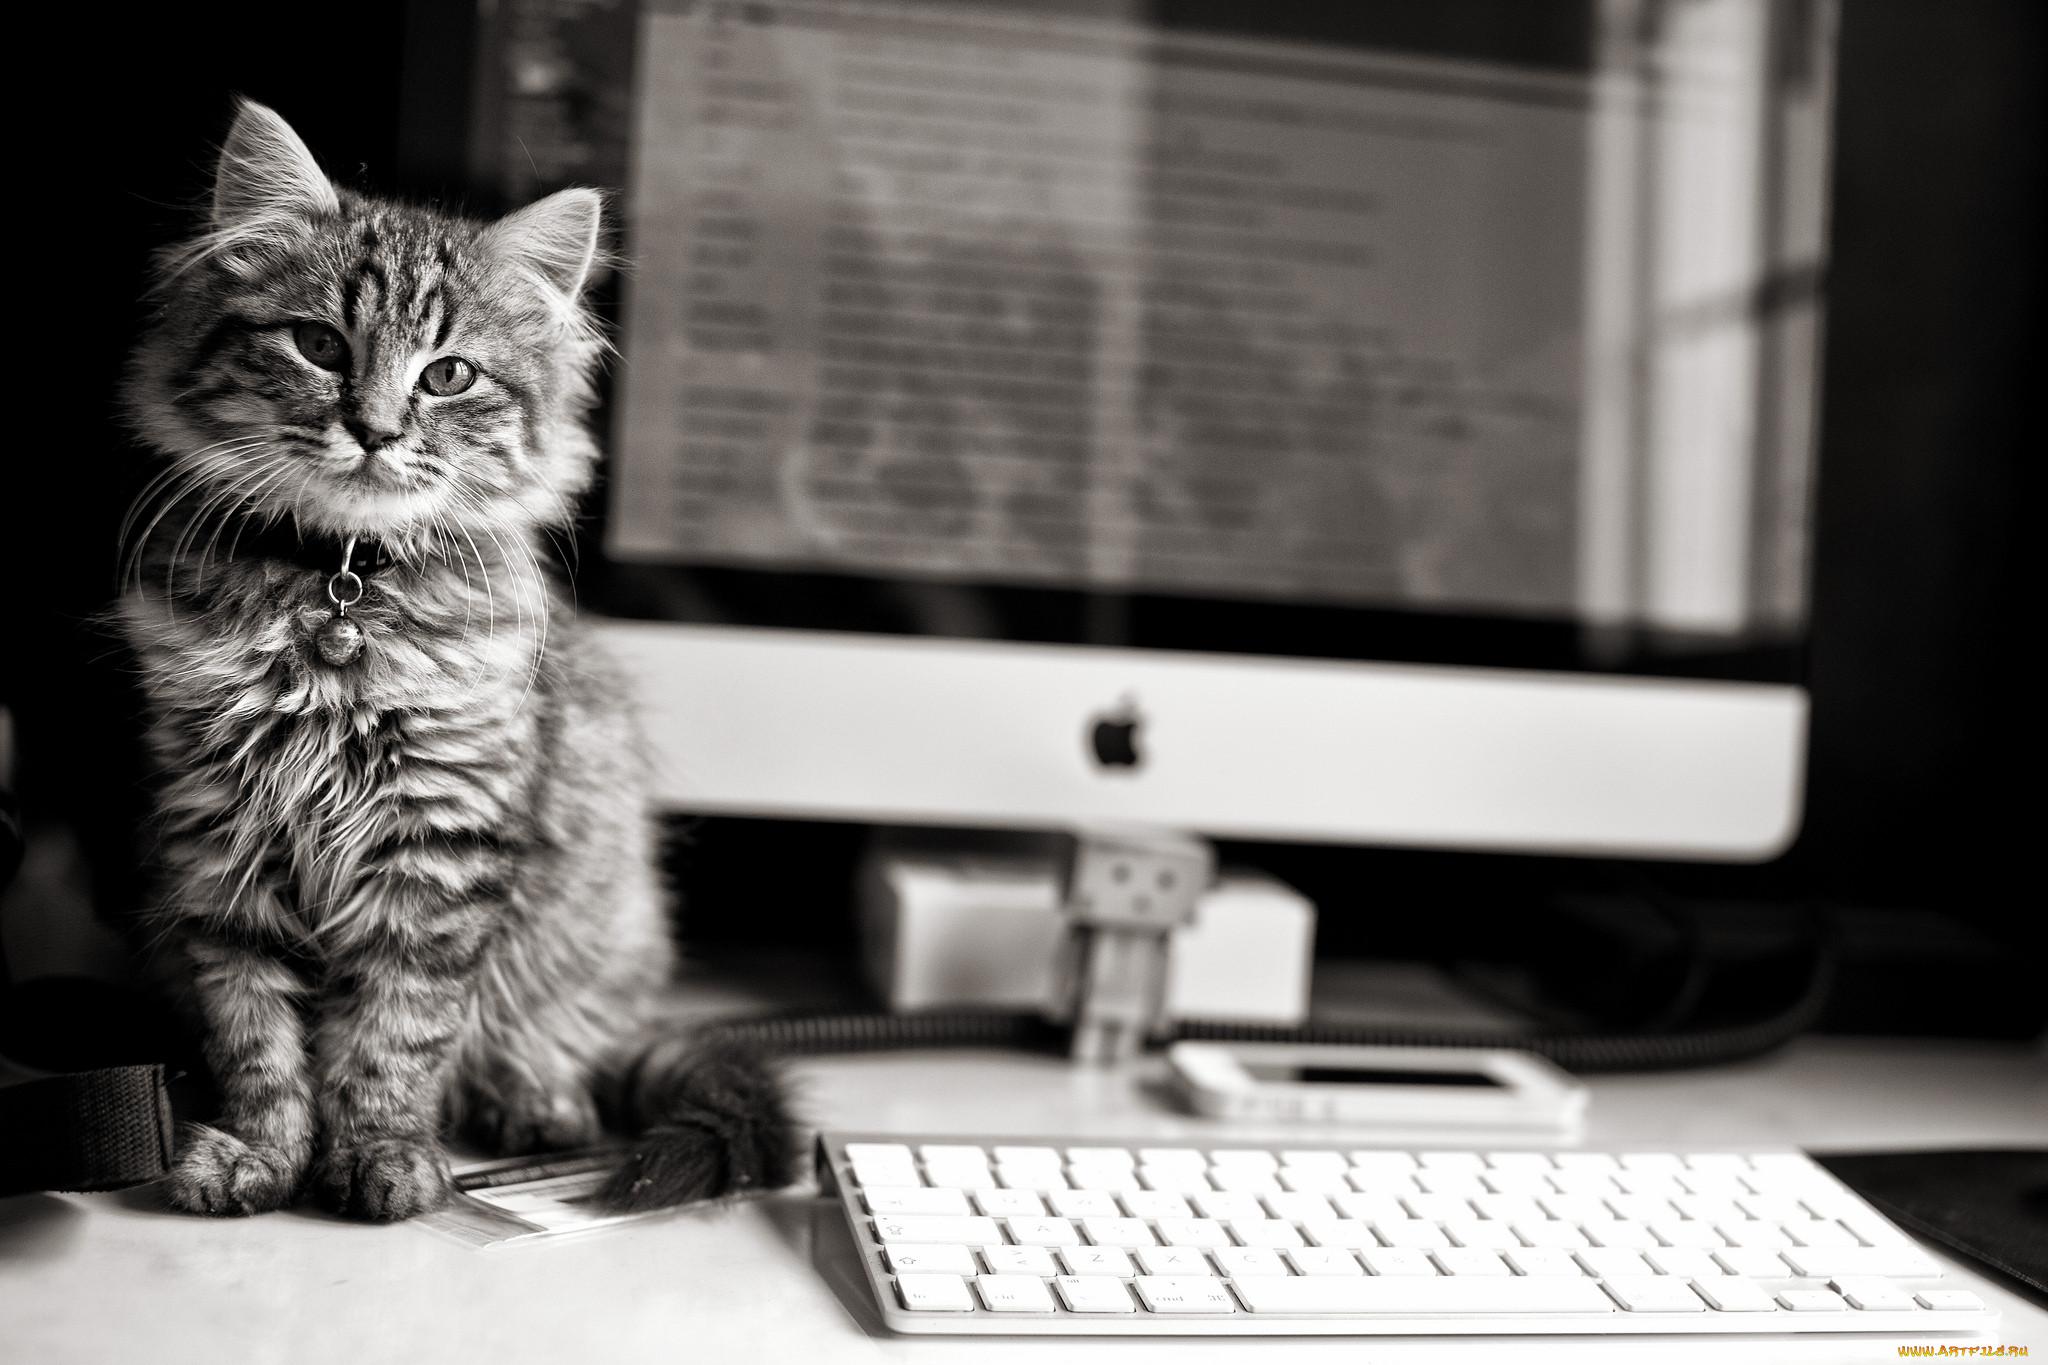 Прикольный котик картинка для клавиатуры монтгомери фильмы